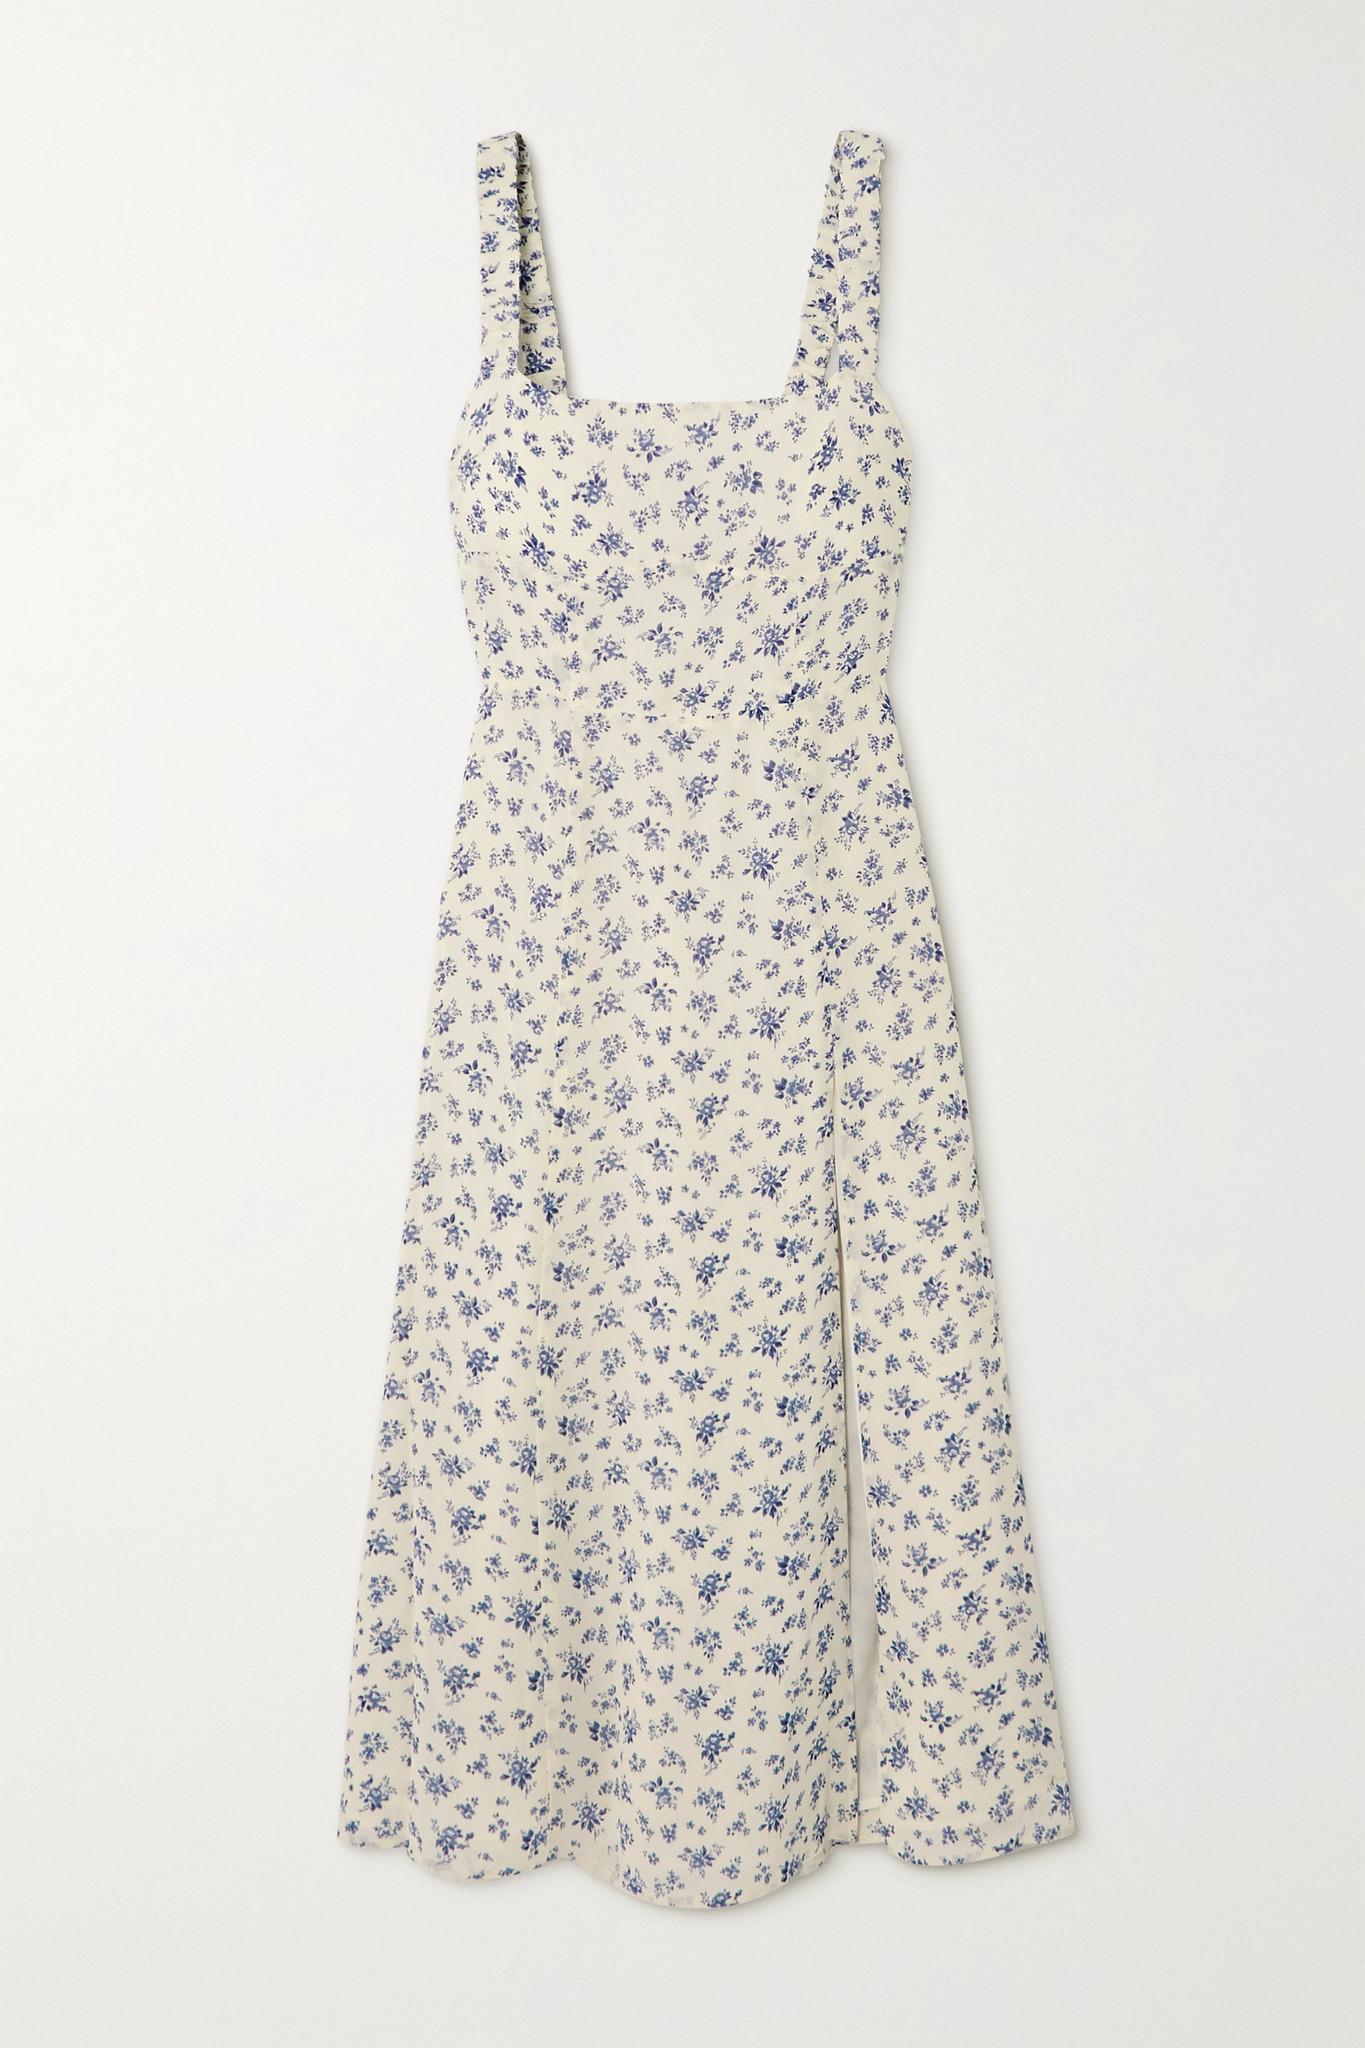 REFORMATION - + Net Sustain Dominique Floral-print Georgette Midi Dress - White - US6